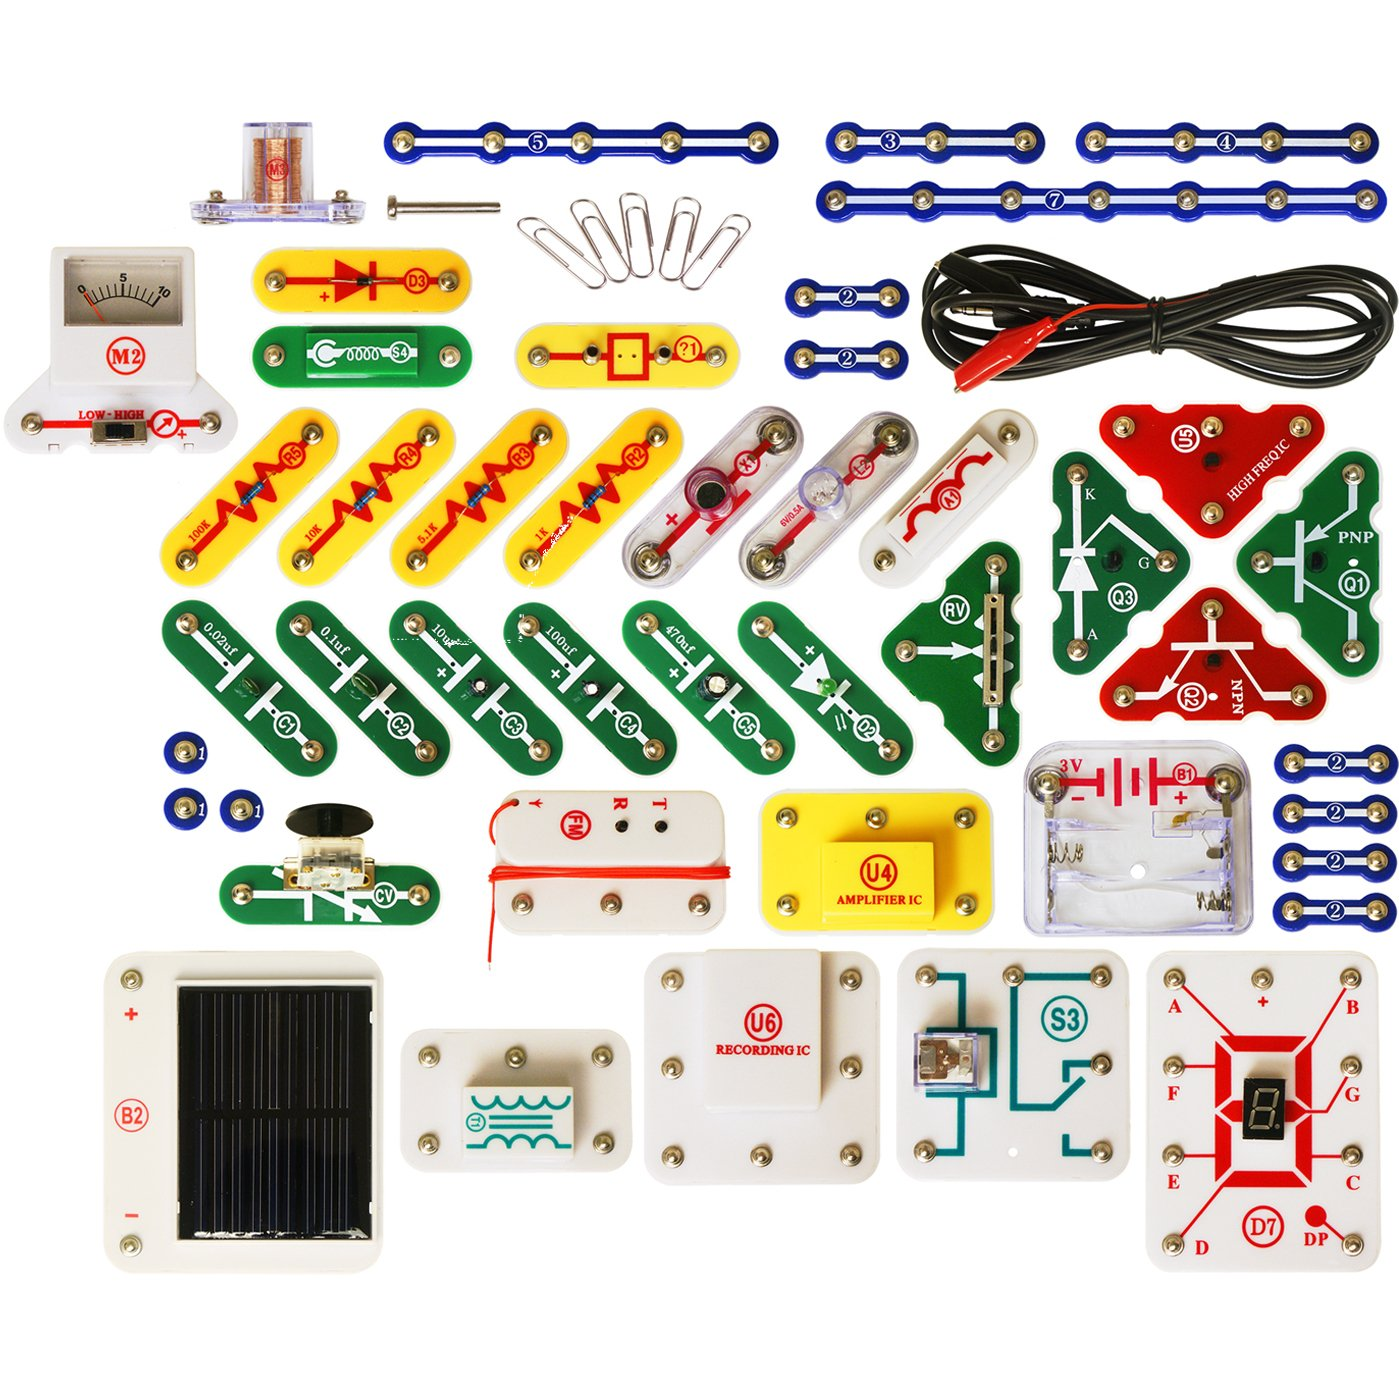 Snap Circuits Uc 60 Upgrade Kit Sc 100 To 750 Elenco Electronics Inc Electronic Set Product Description